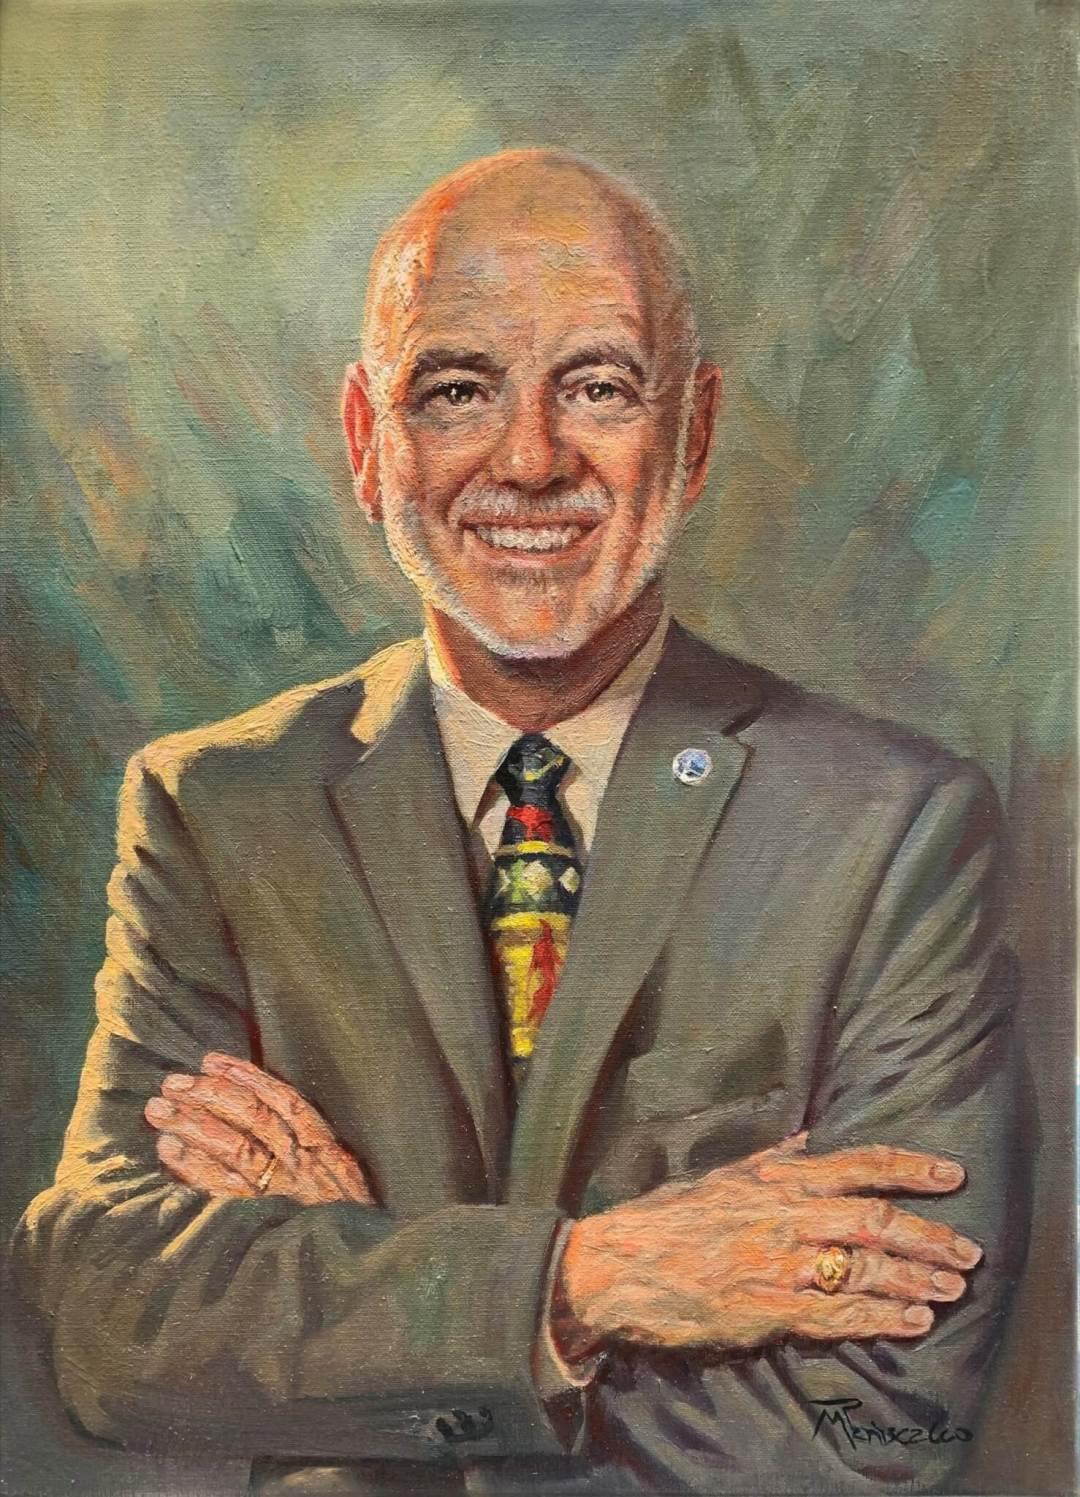 Dr John Vena